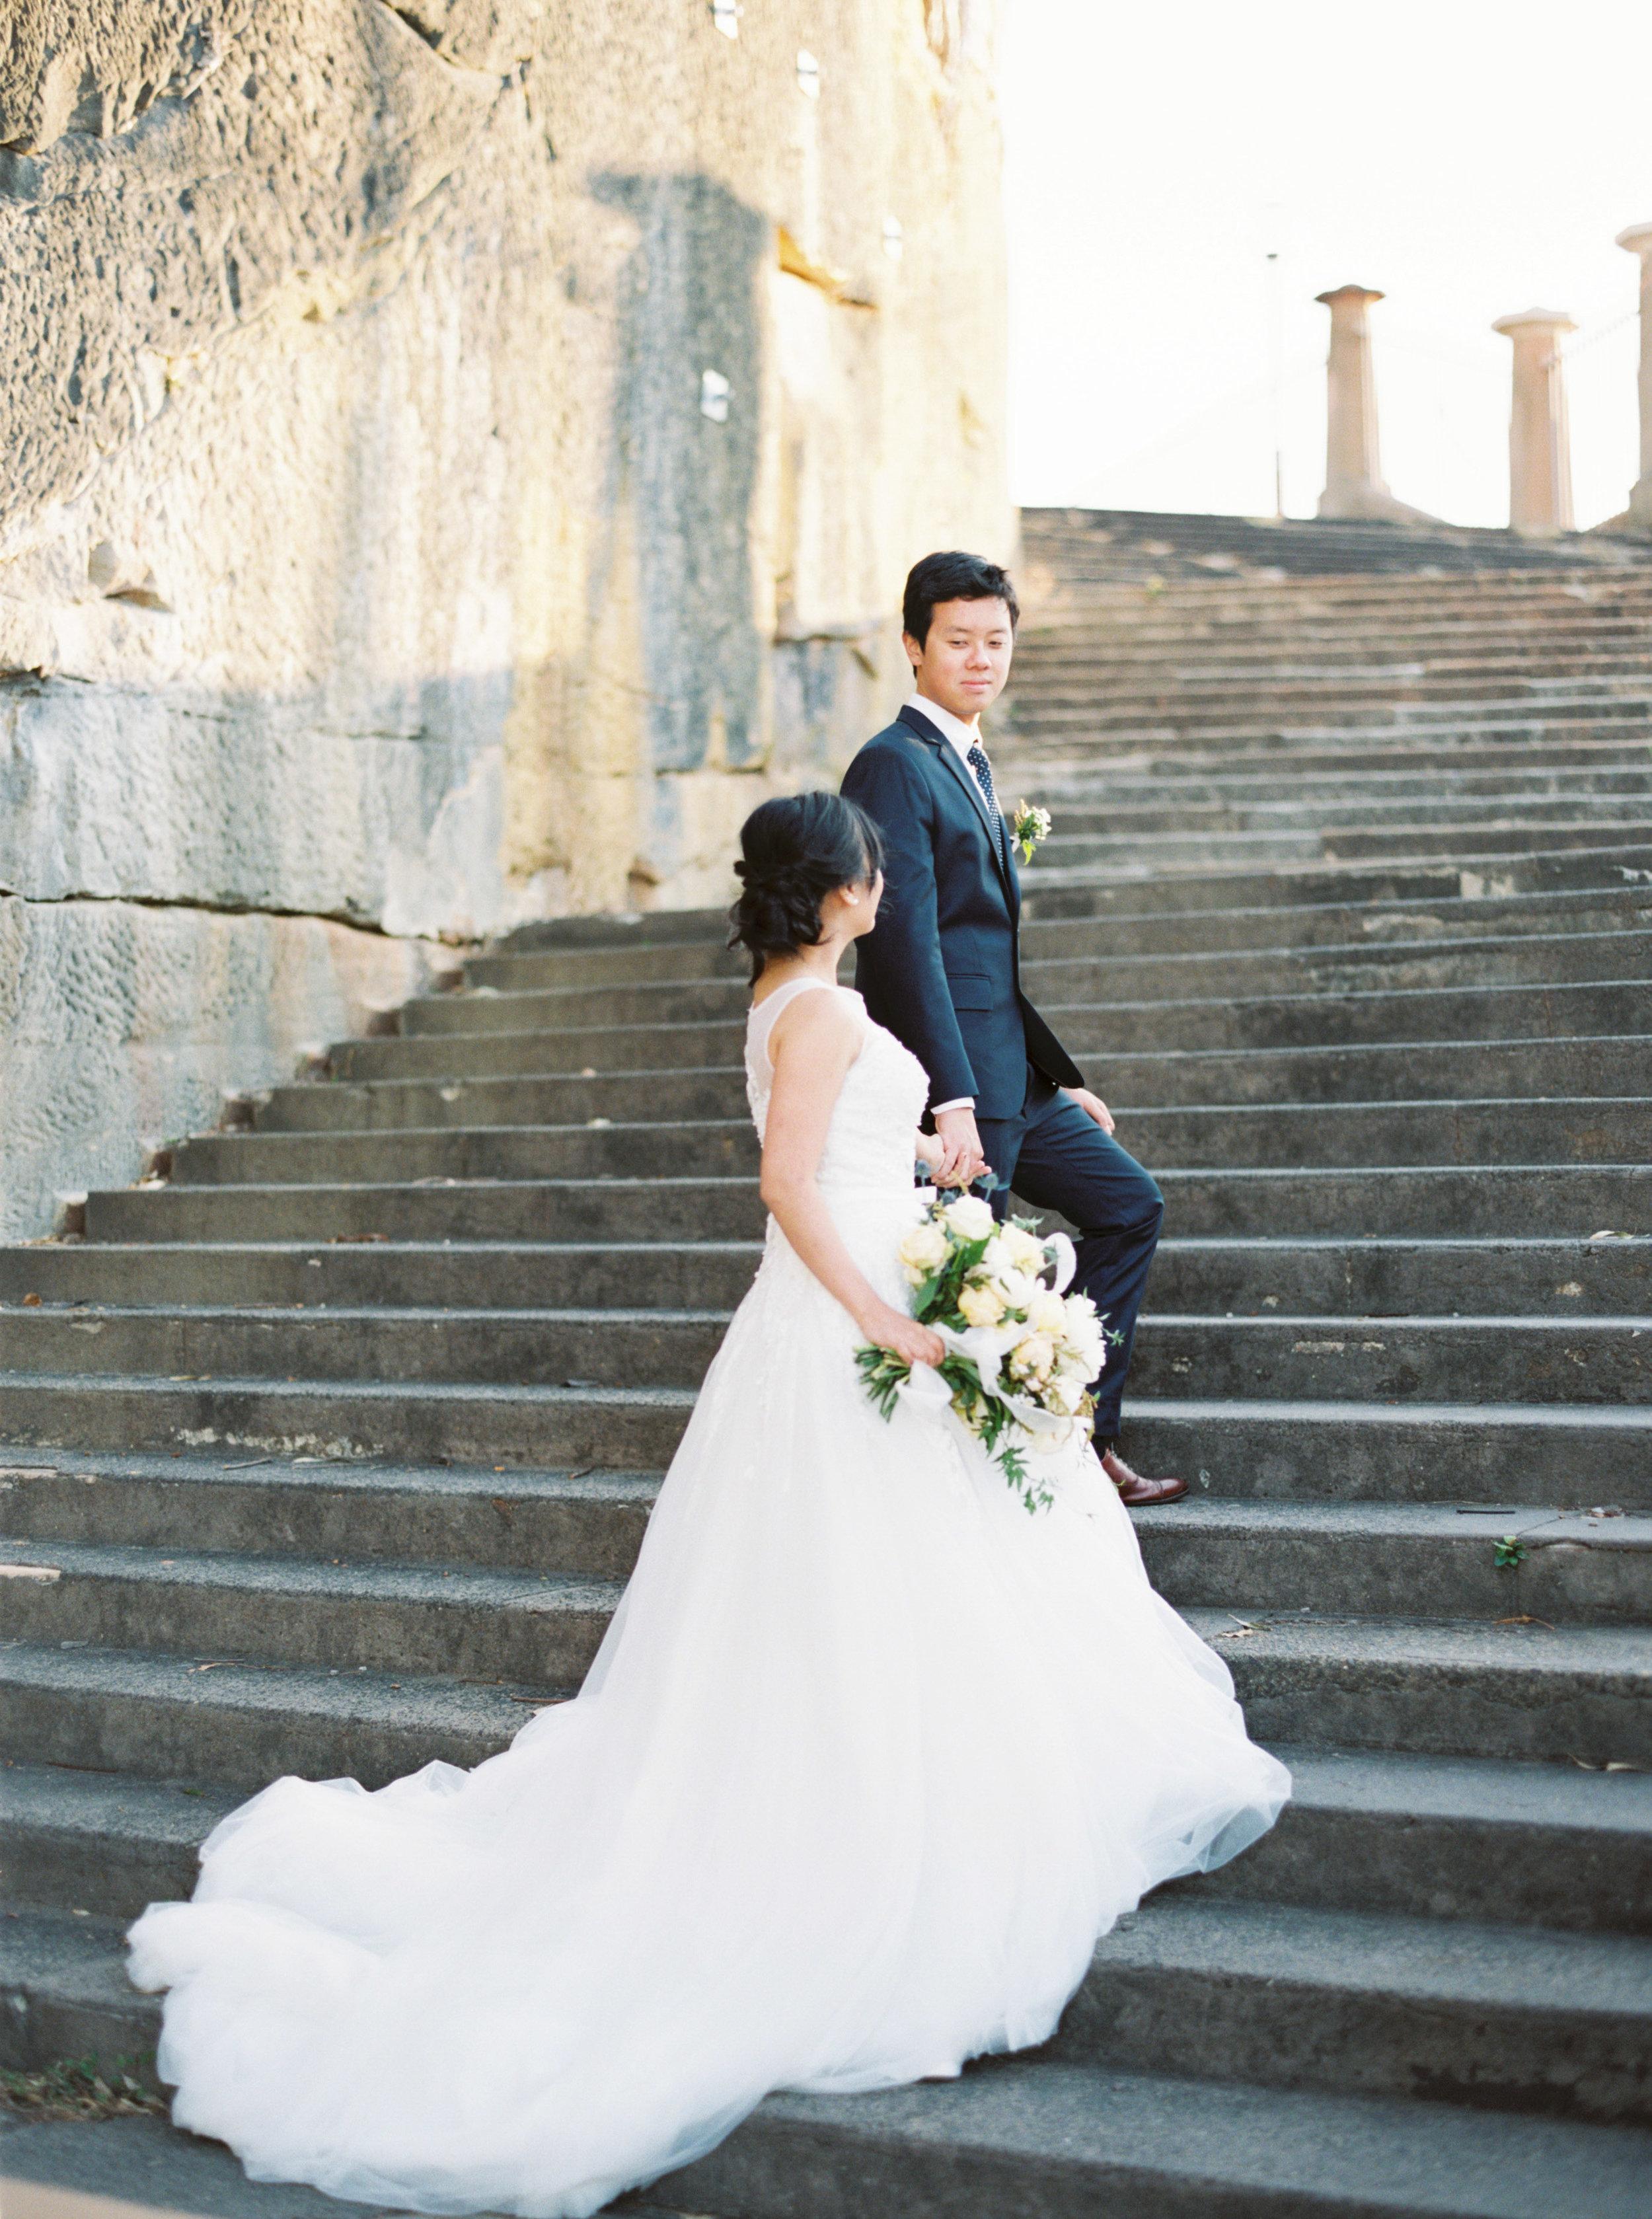 00007- Australia Sydney Wedding Photographer Sheri McMahon.jpg